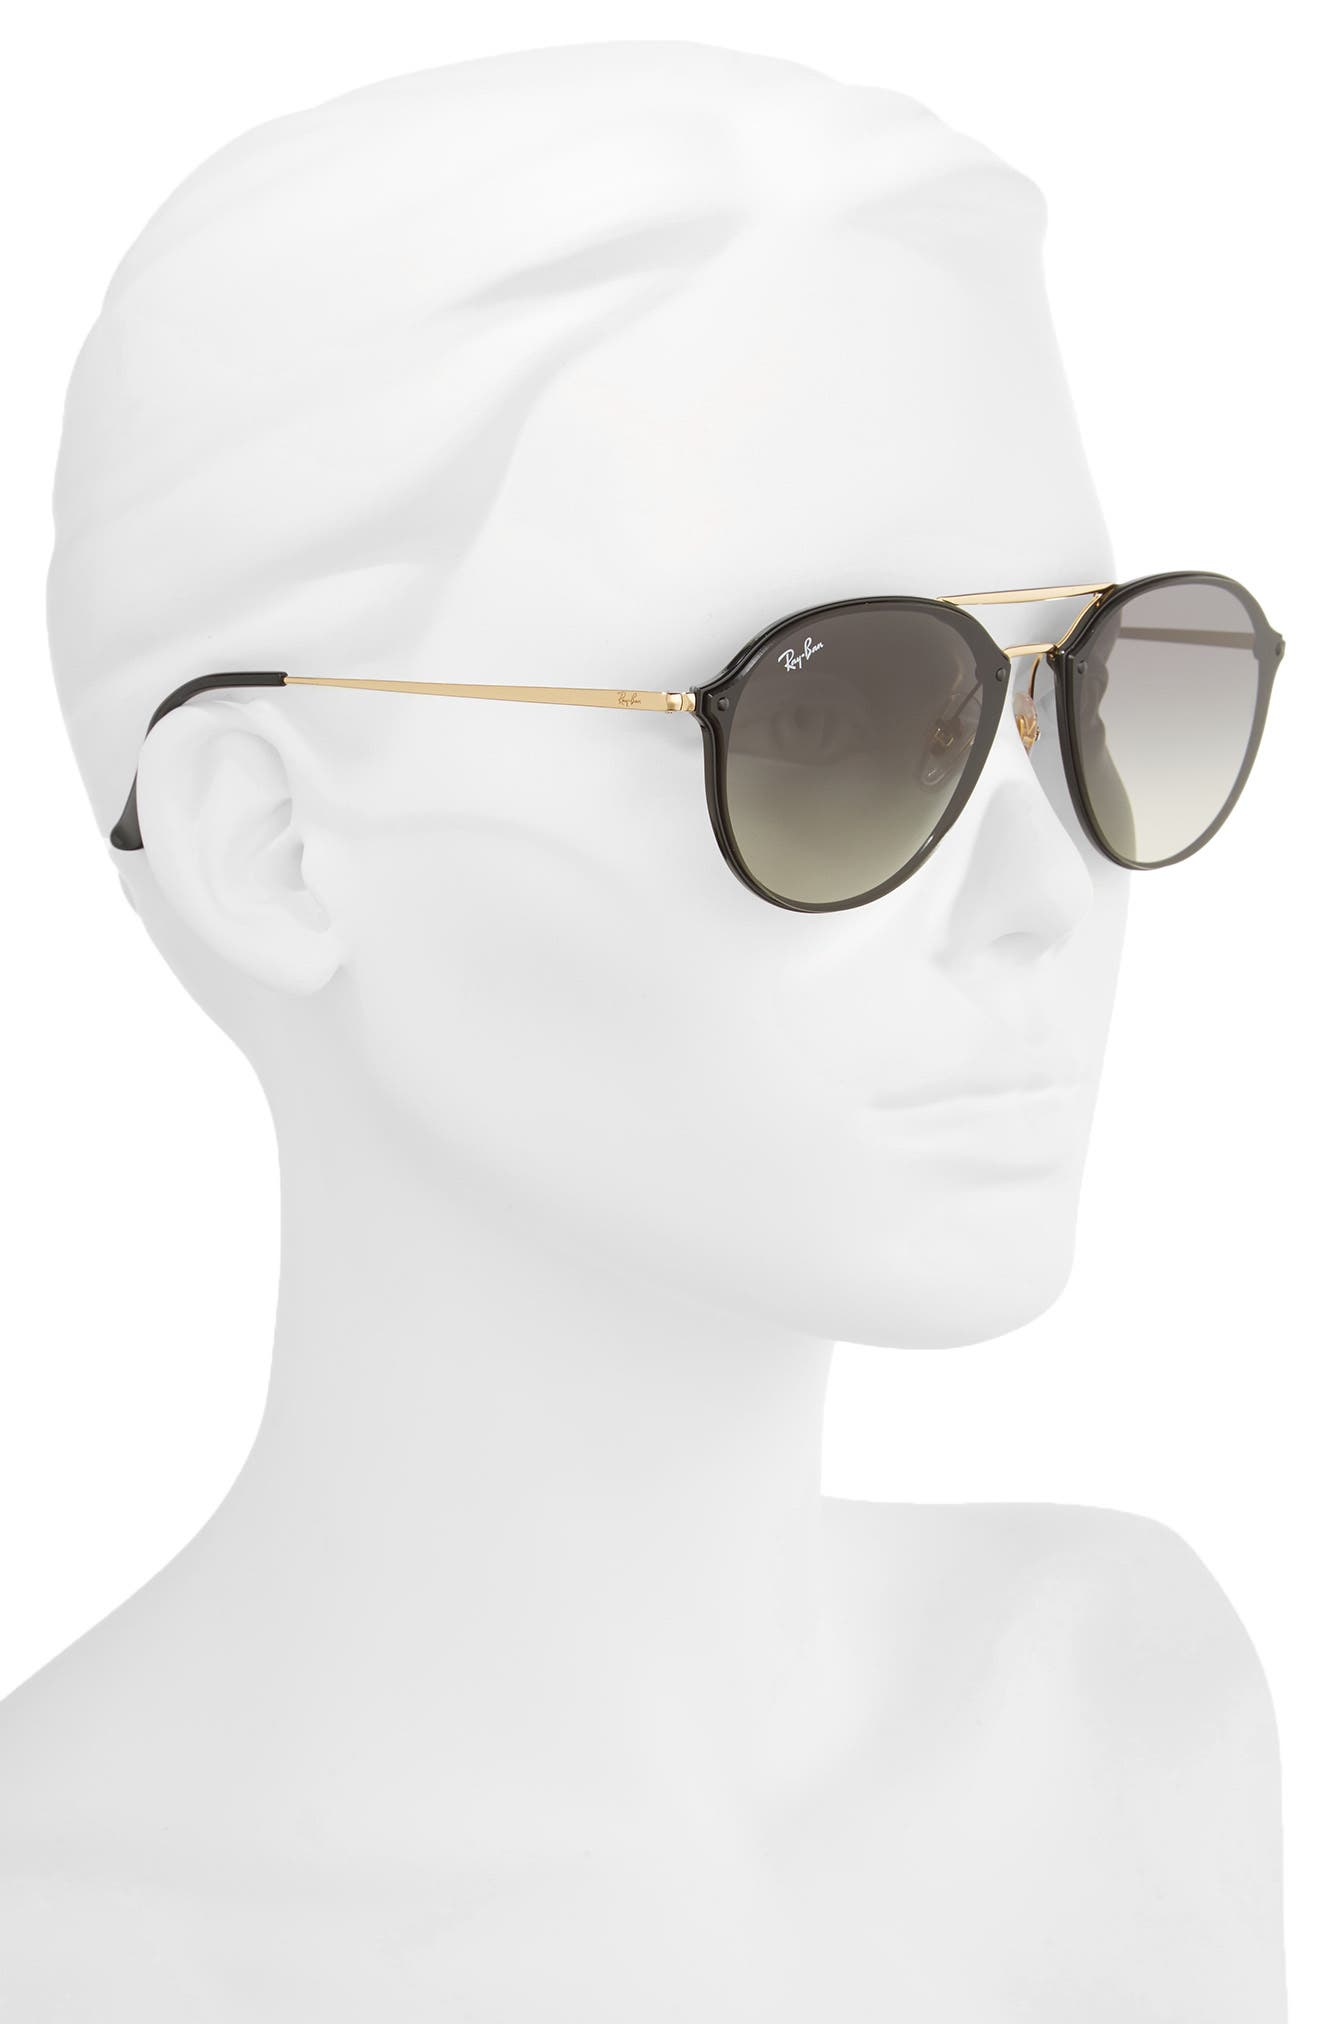 62mm Gradient Lens Aviator Sunglasses,                             Alternate thumbnail 3, color,                             BLACK